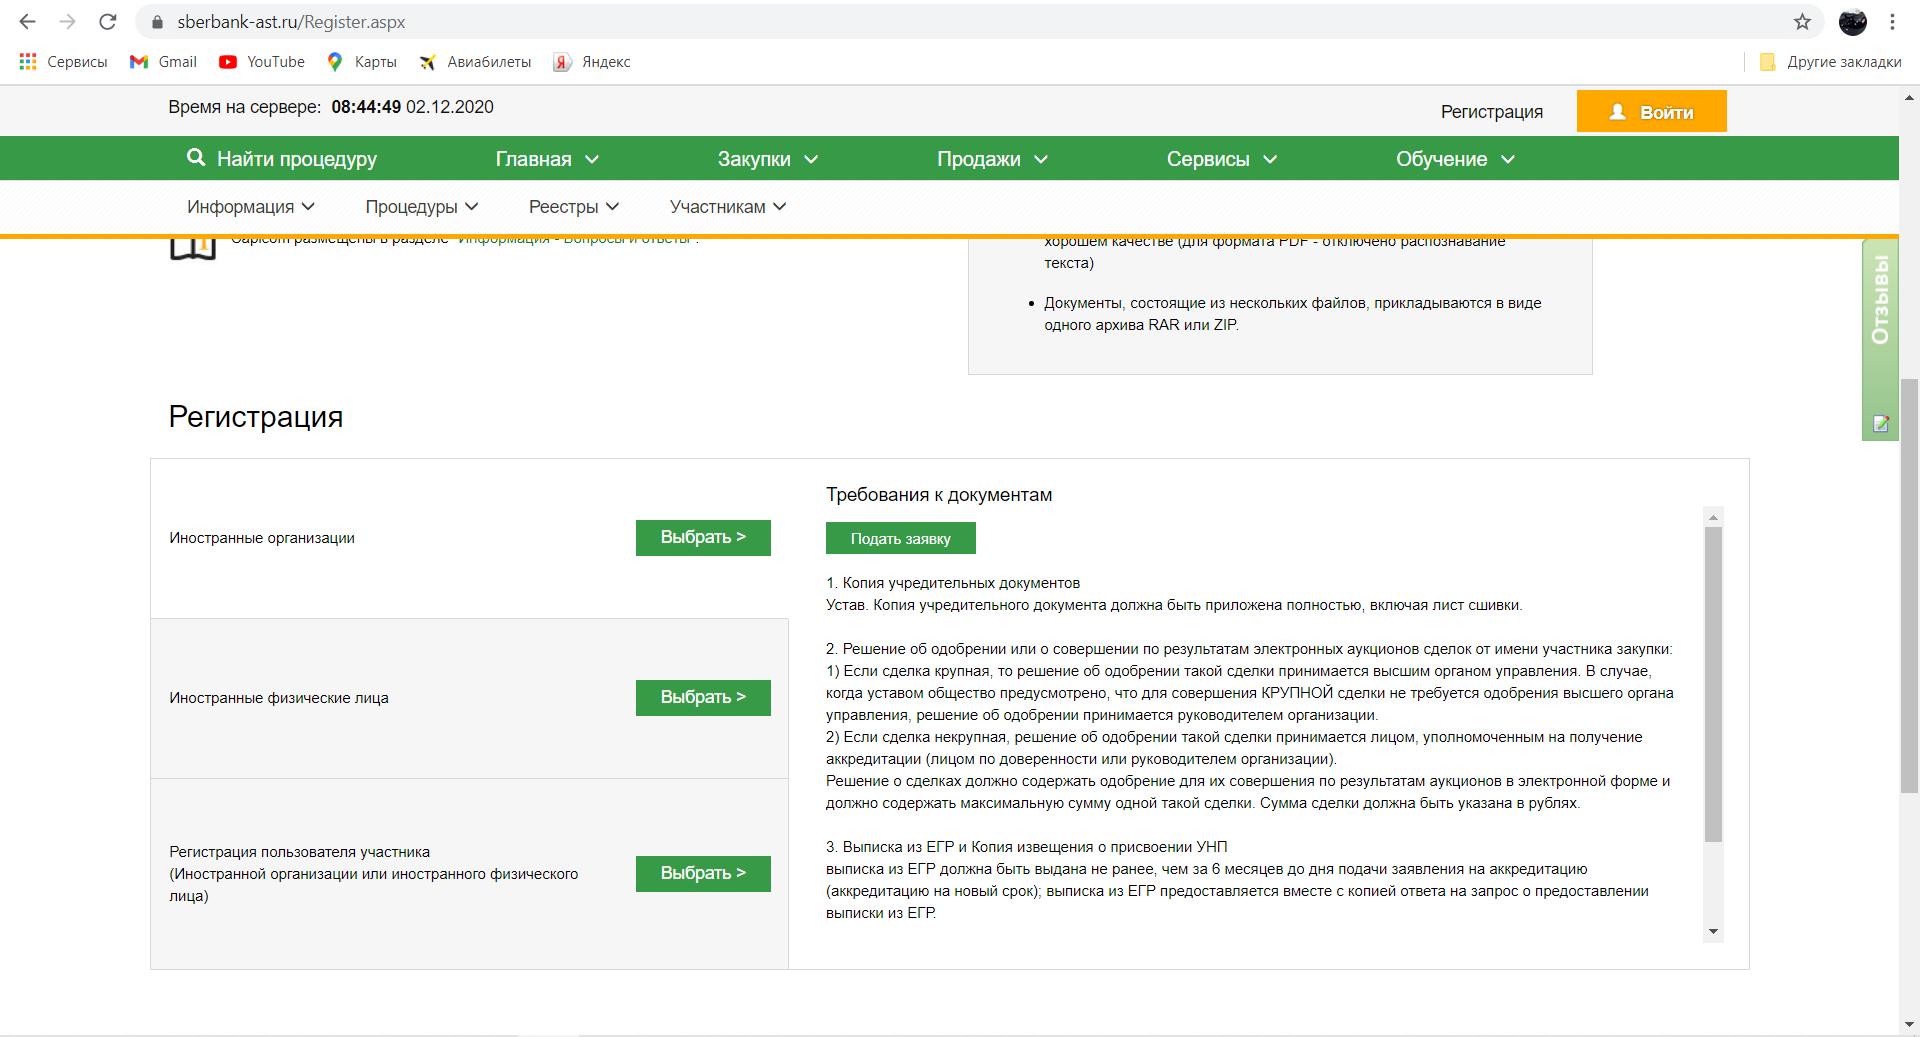 регистрация на платформе сбербанк аст